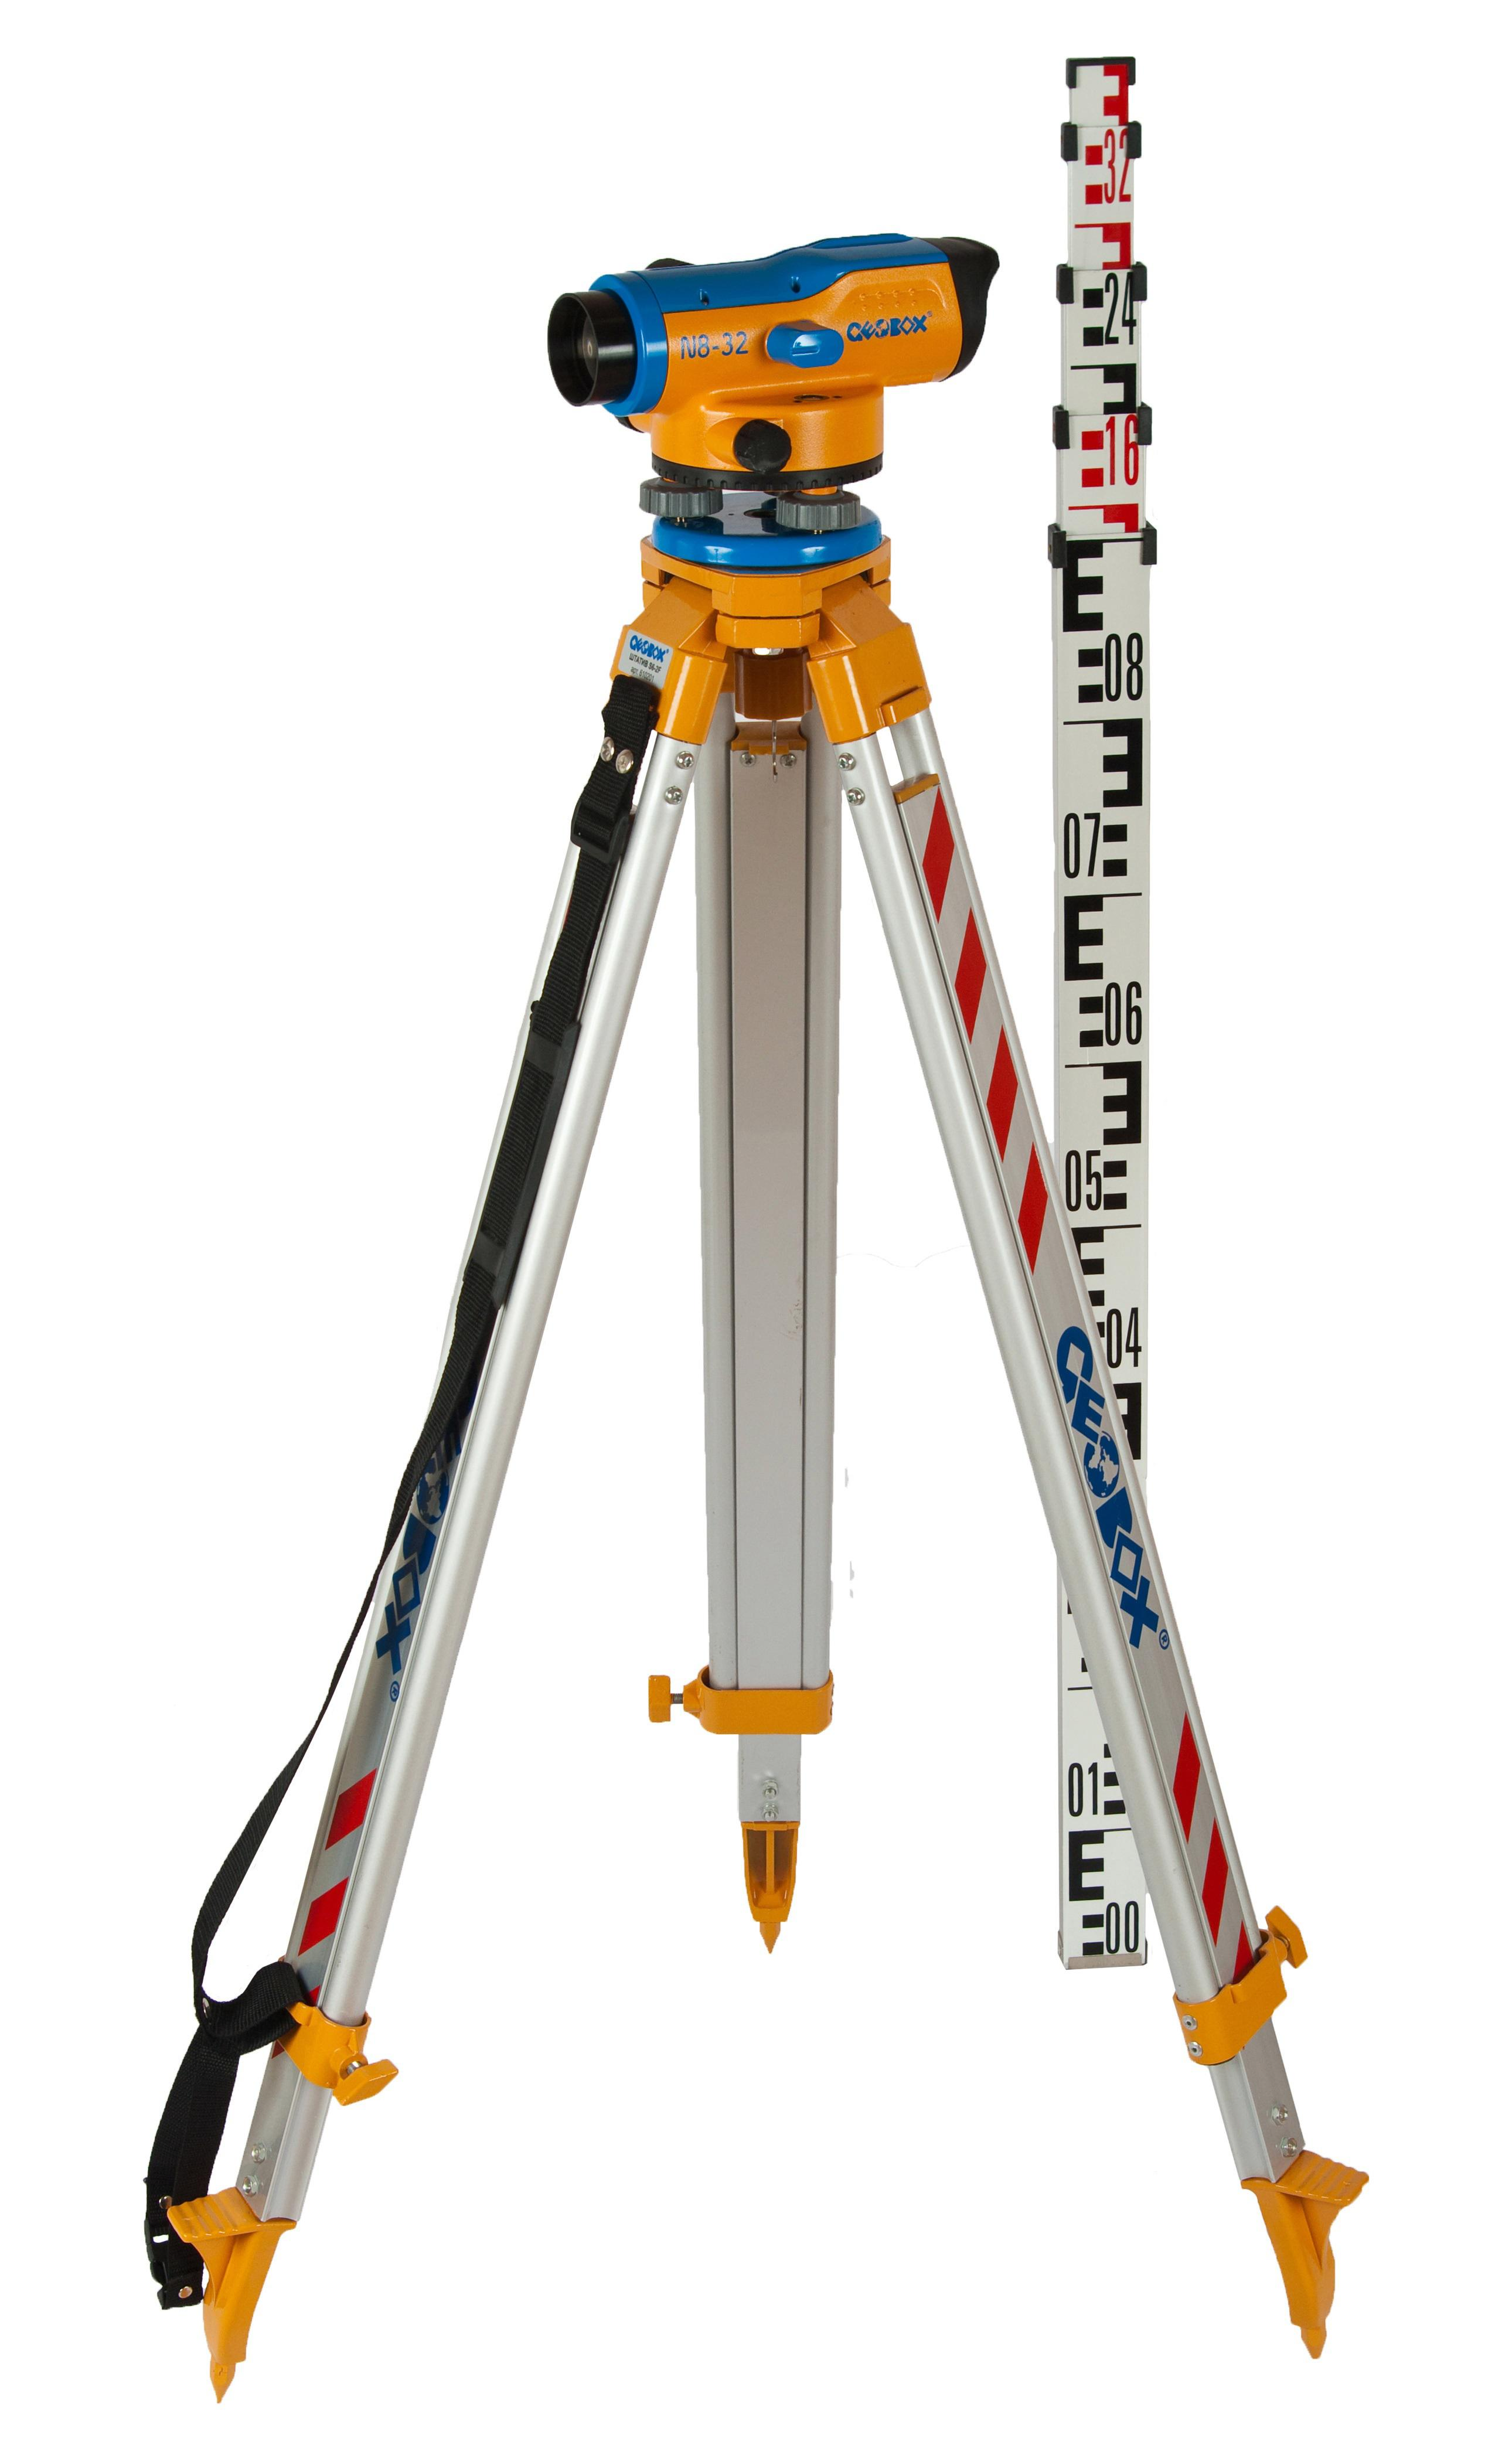 Нивелир оптический Geobox N8-32 trio